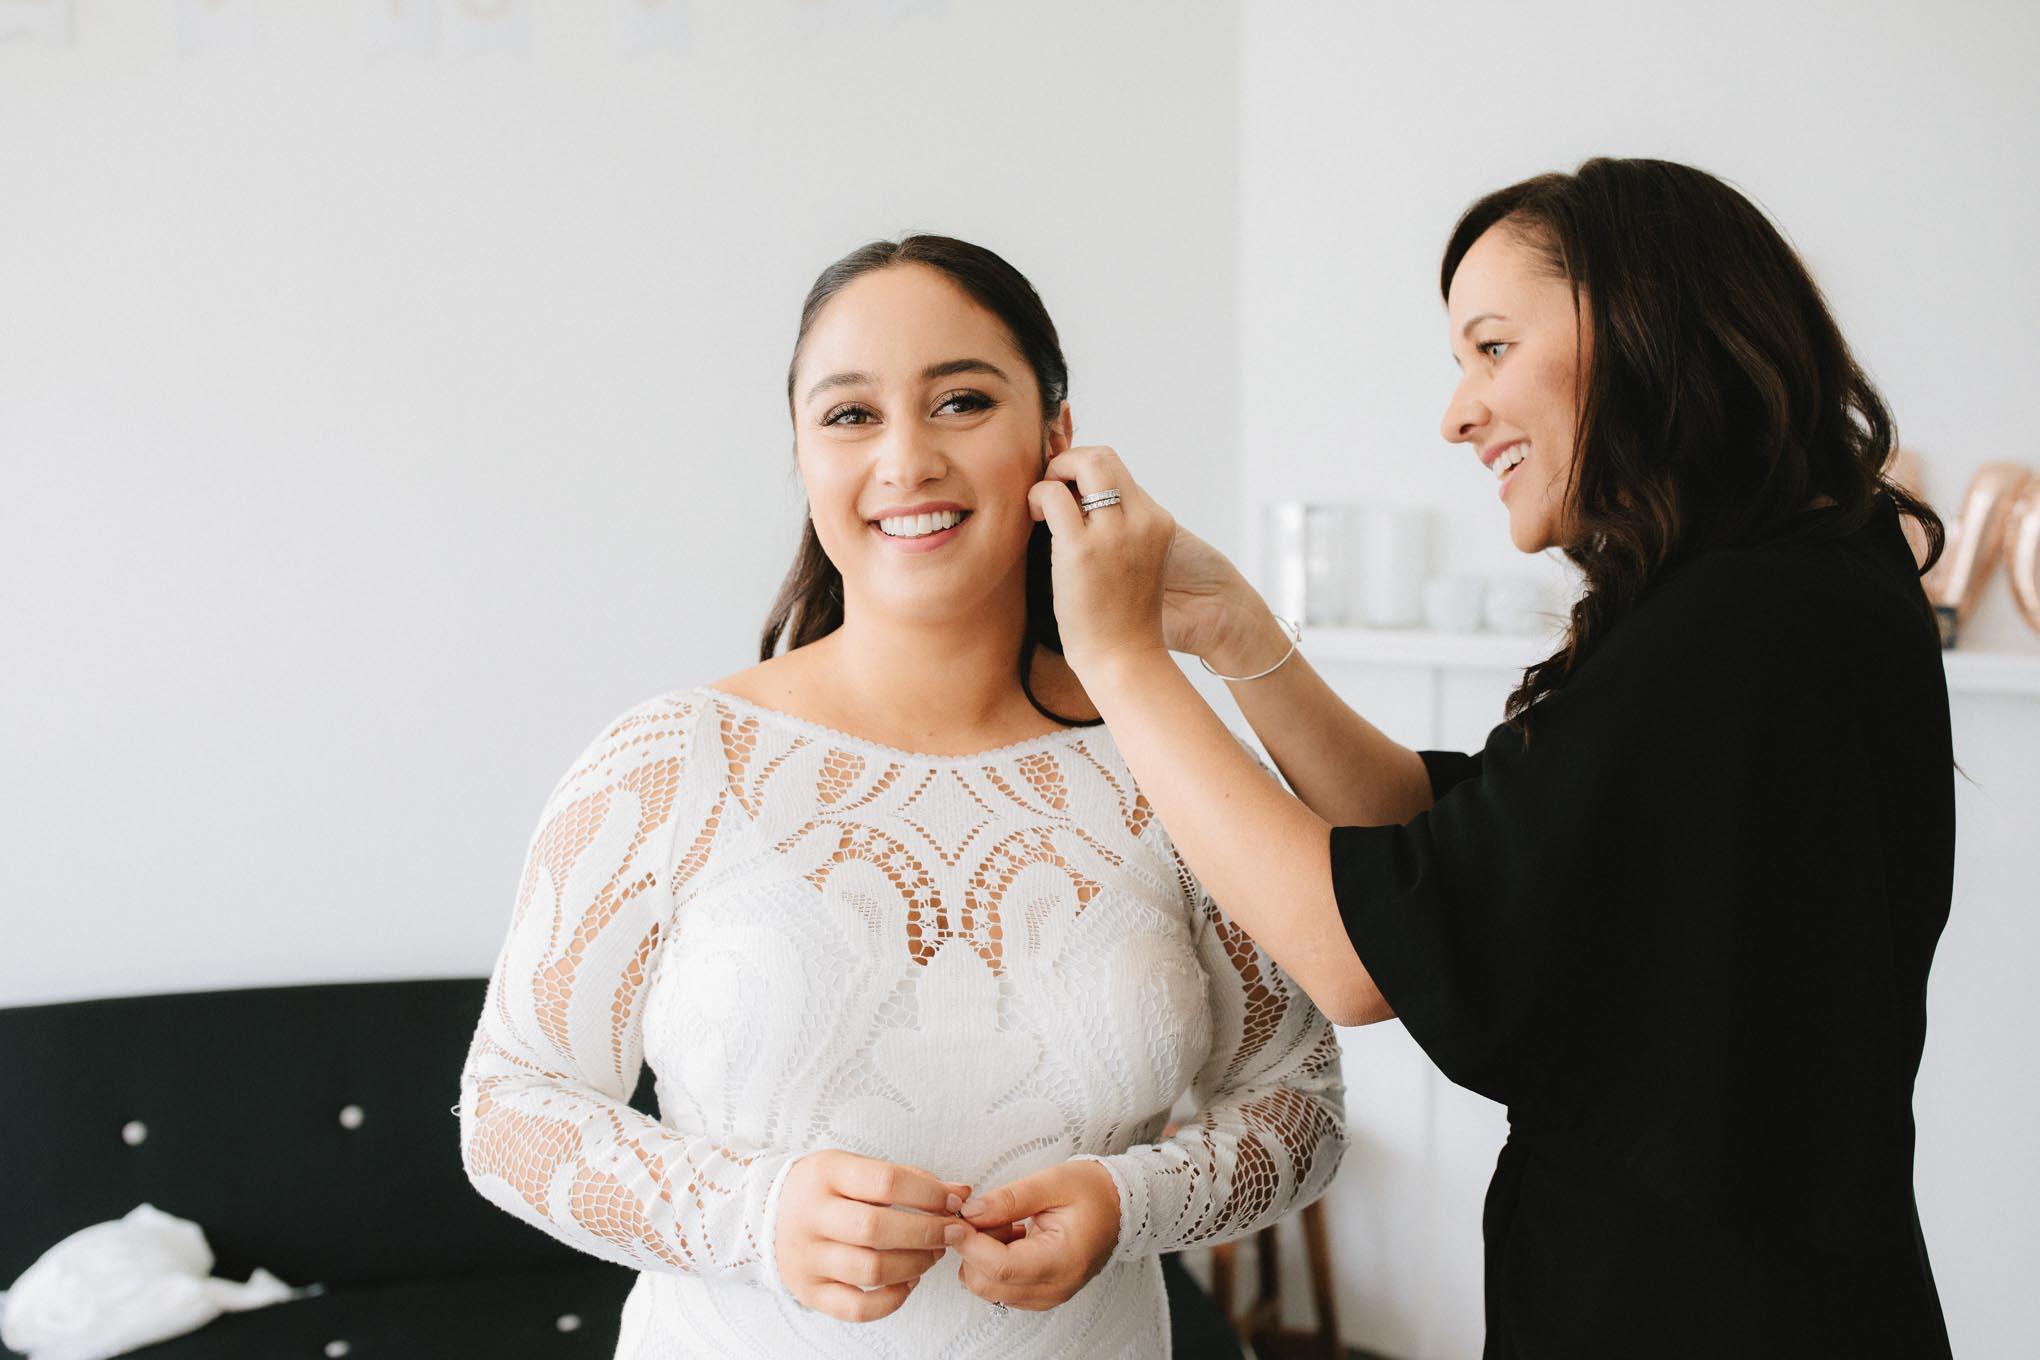 Categories: Weddings-Real Wedding: Dannielle & Ihaia - Photography by Tim Kelly & Nadine Ellen